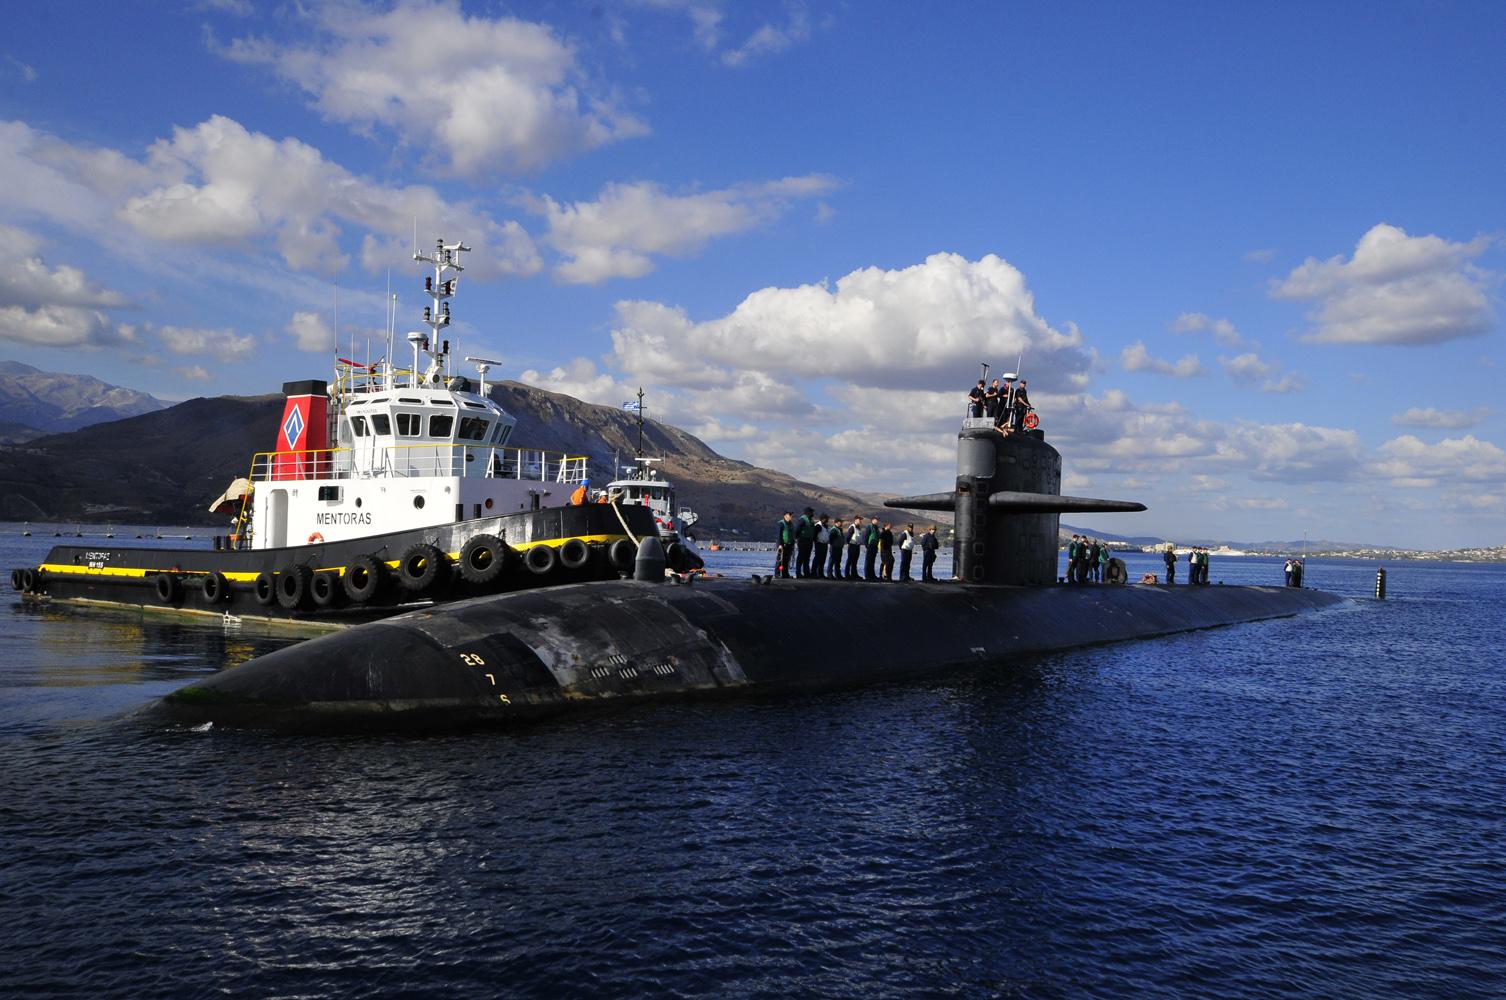 USS HELENA SSN-725 am 23.09.2013 Souda Bay, KretaBild: U.S. Navy